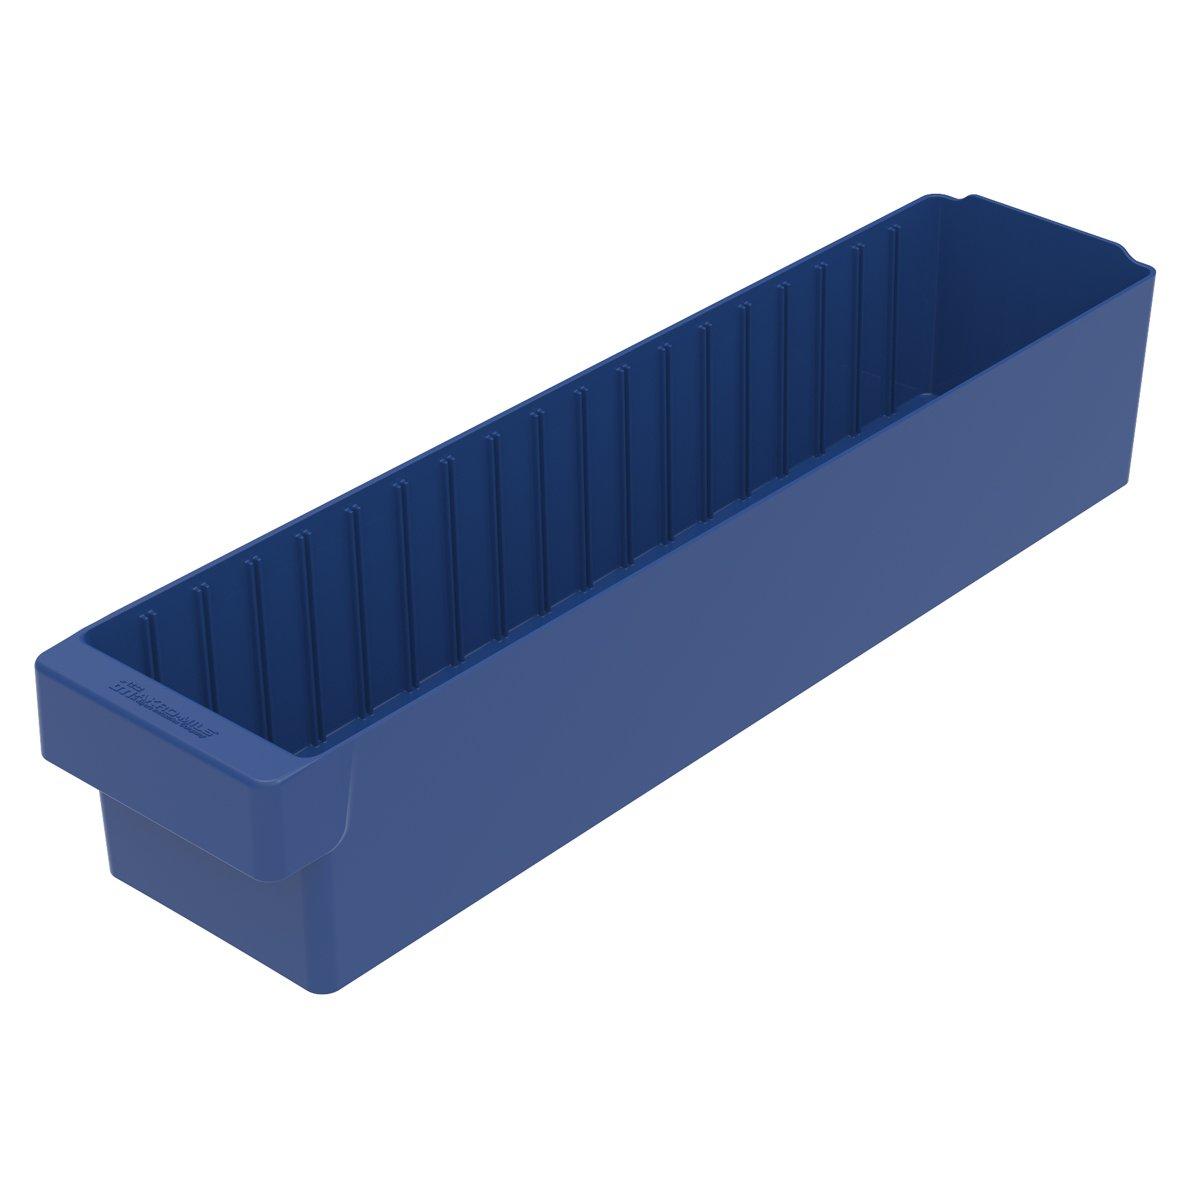 Akro-Mils 31164 23-7/8-Inch L by 5-9/16-Inch W by 4-5/8-Inch H, AkroDrawer Plastic Storage Drawer, Blue, Case of 6